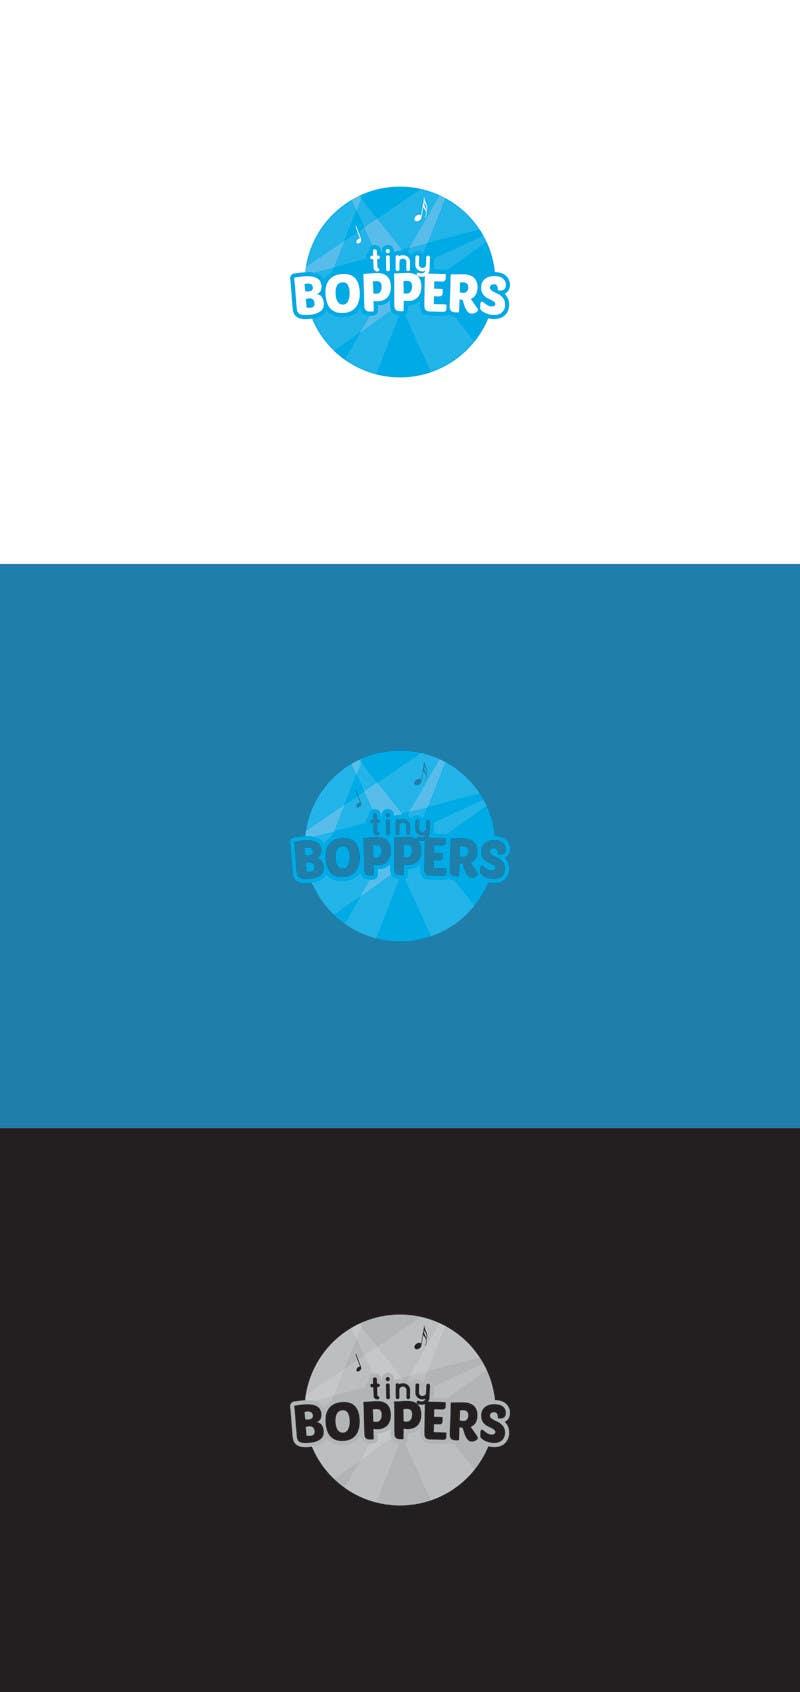 Kilpailutyö #36 kilpailussa Design a logo for Tiny Boppers - a preschool music & movement class